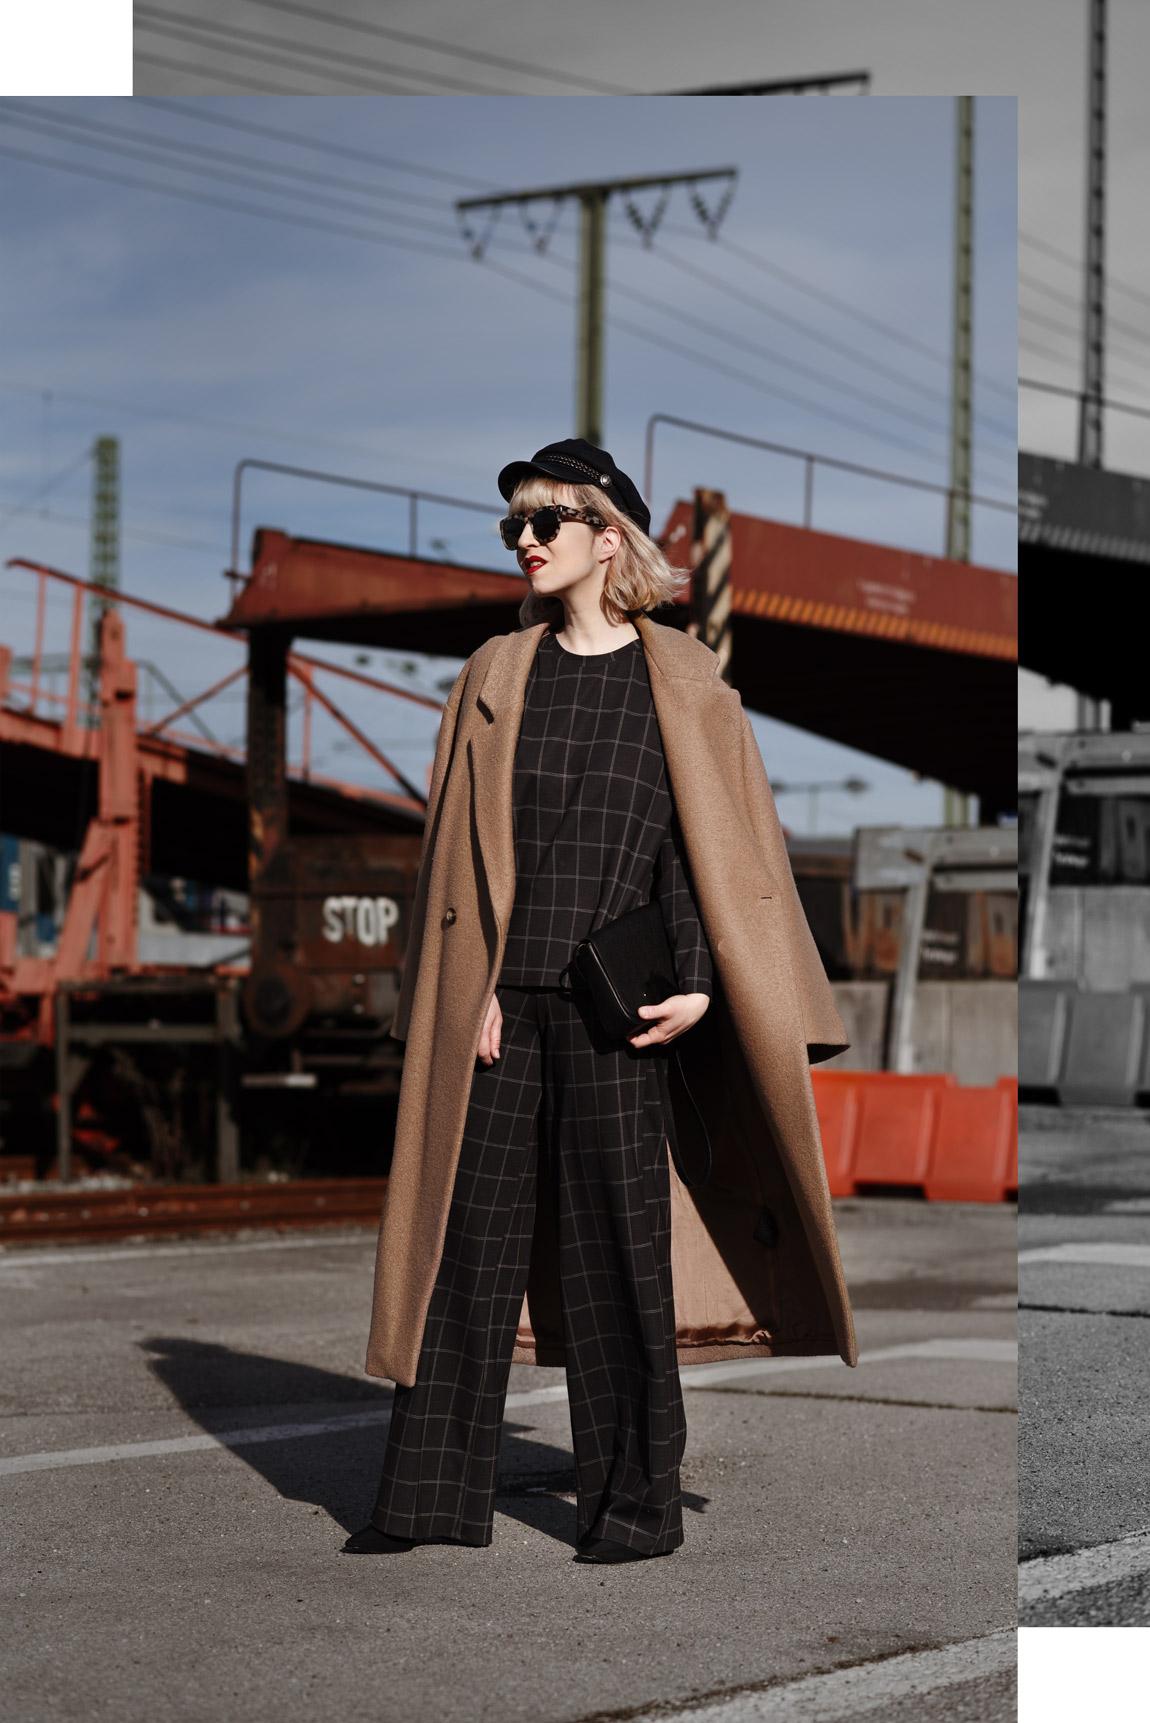 zweiteiler, ootd, outfit, zara, mantel, oversized, twopiece, fashionblogger, modeblogger, münchen, blog, style, look, streetstyle, inspiration, blond, karo, kariert